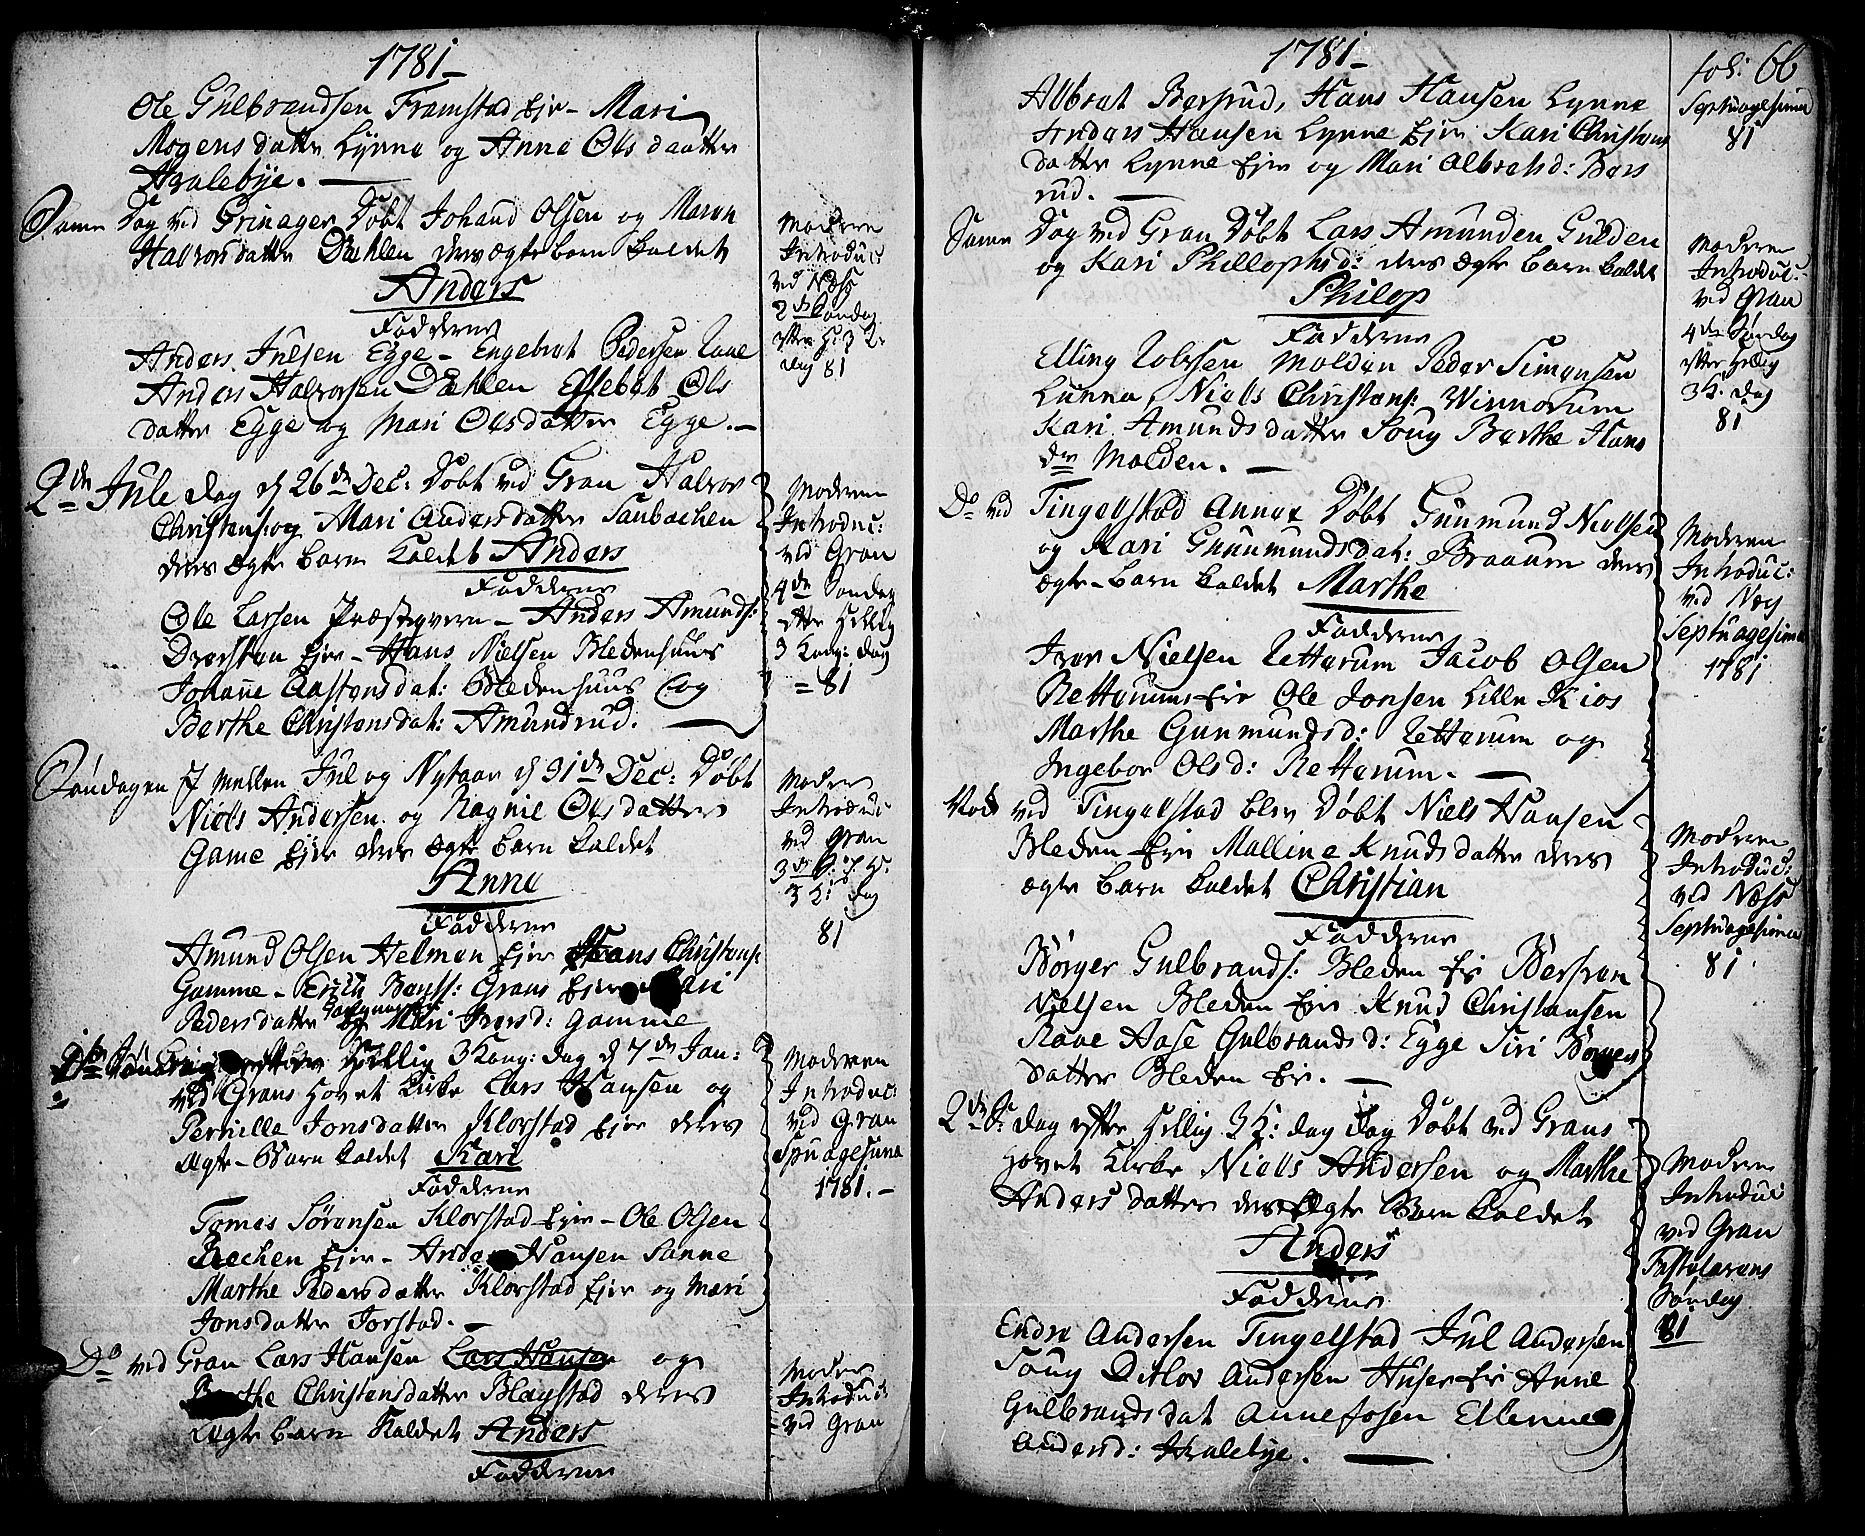 SAH, Gran prestekontor, Ministerialbok nr. 5, 1776-1788, s. 66